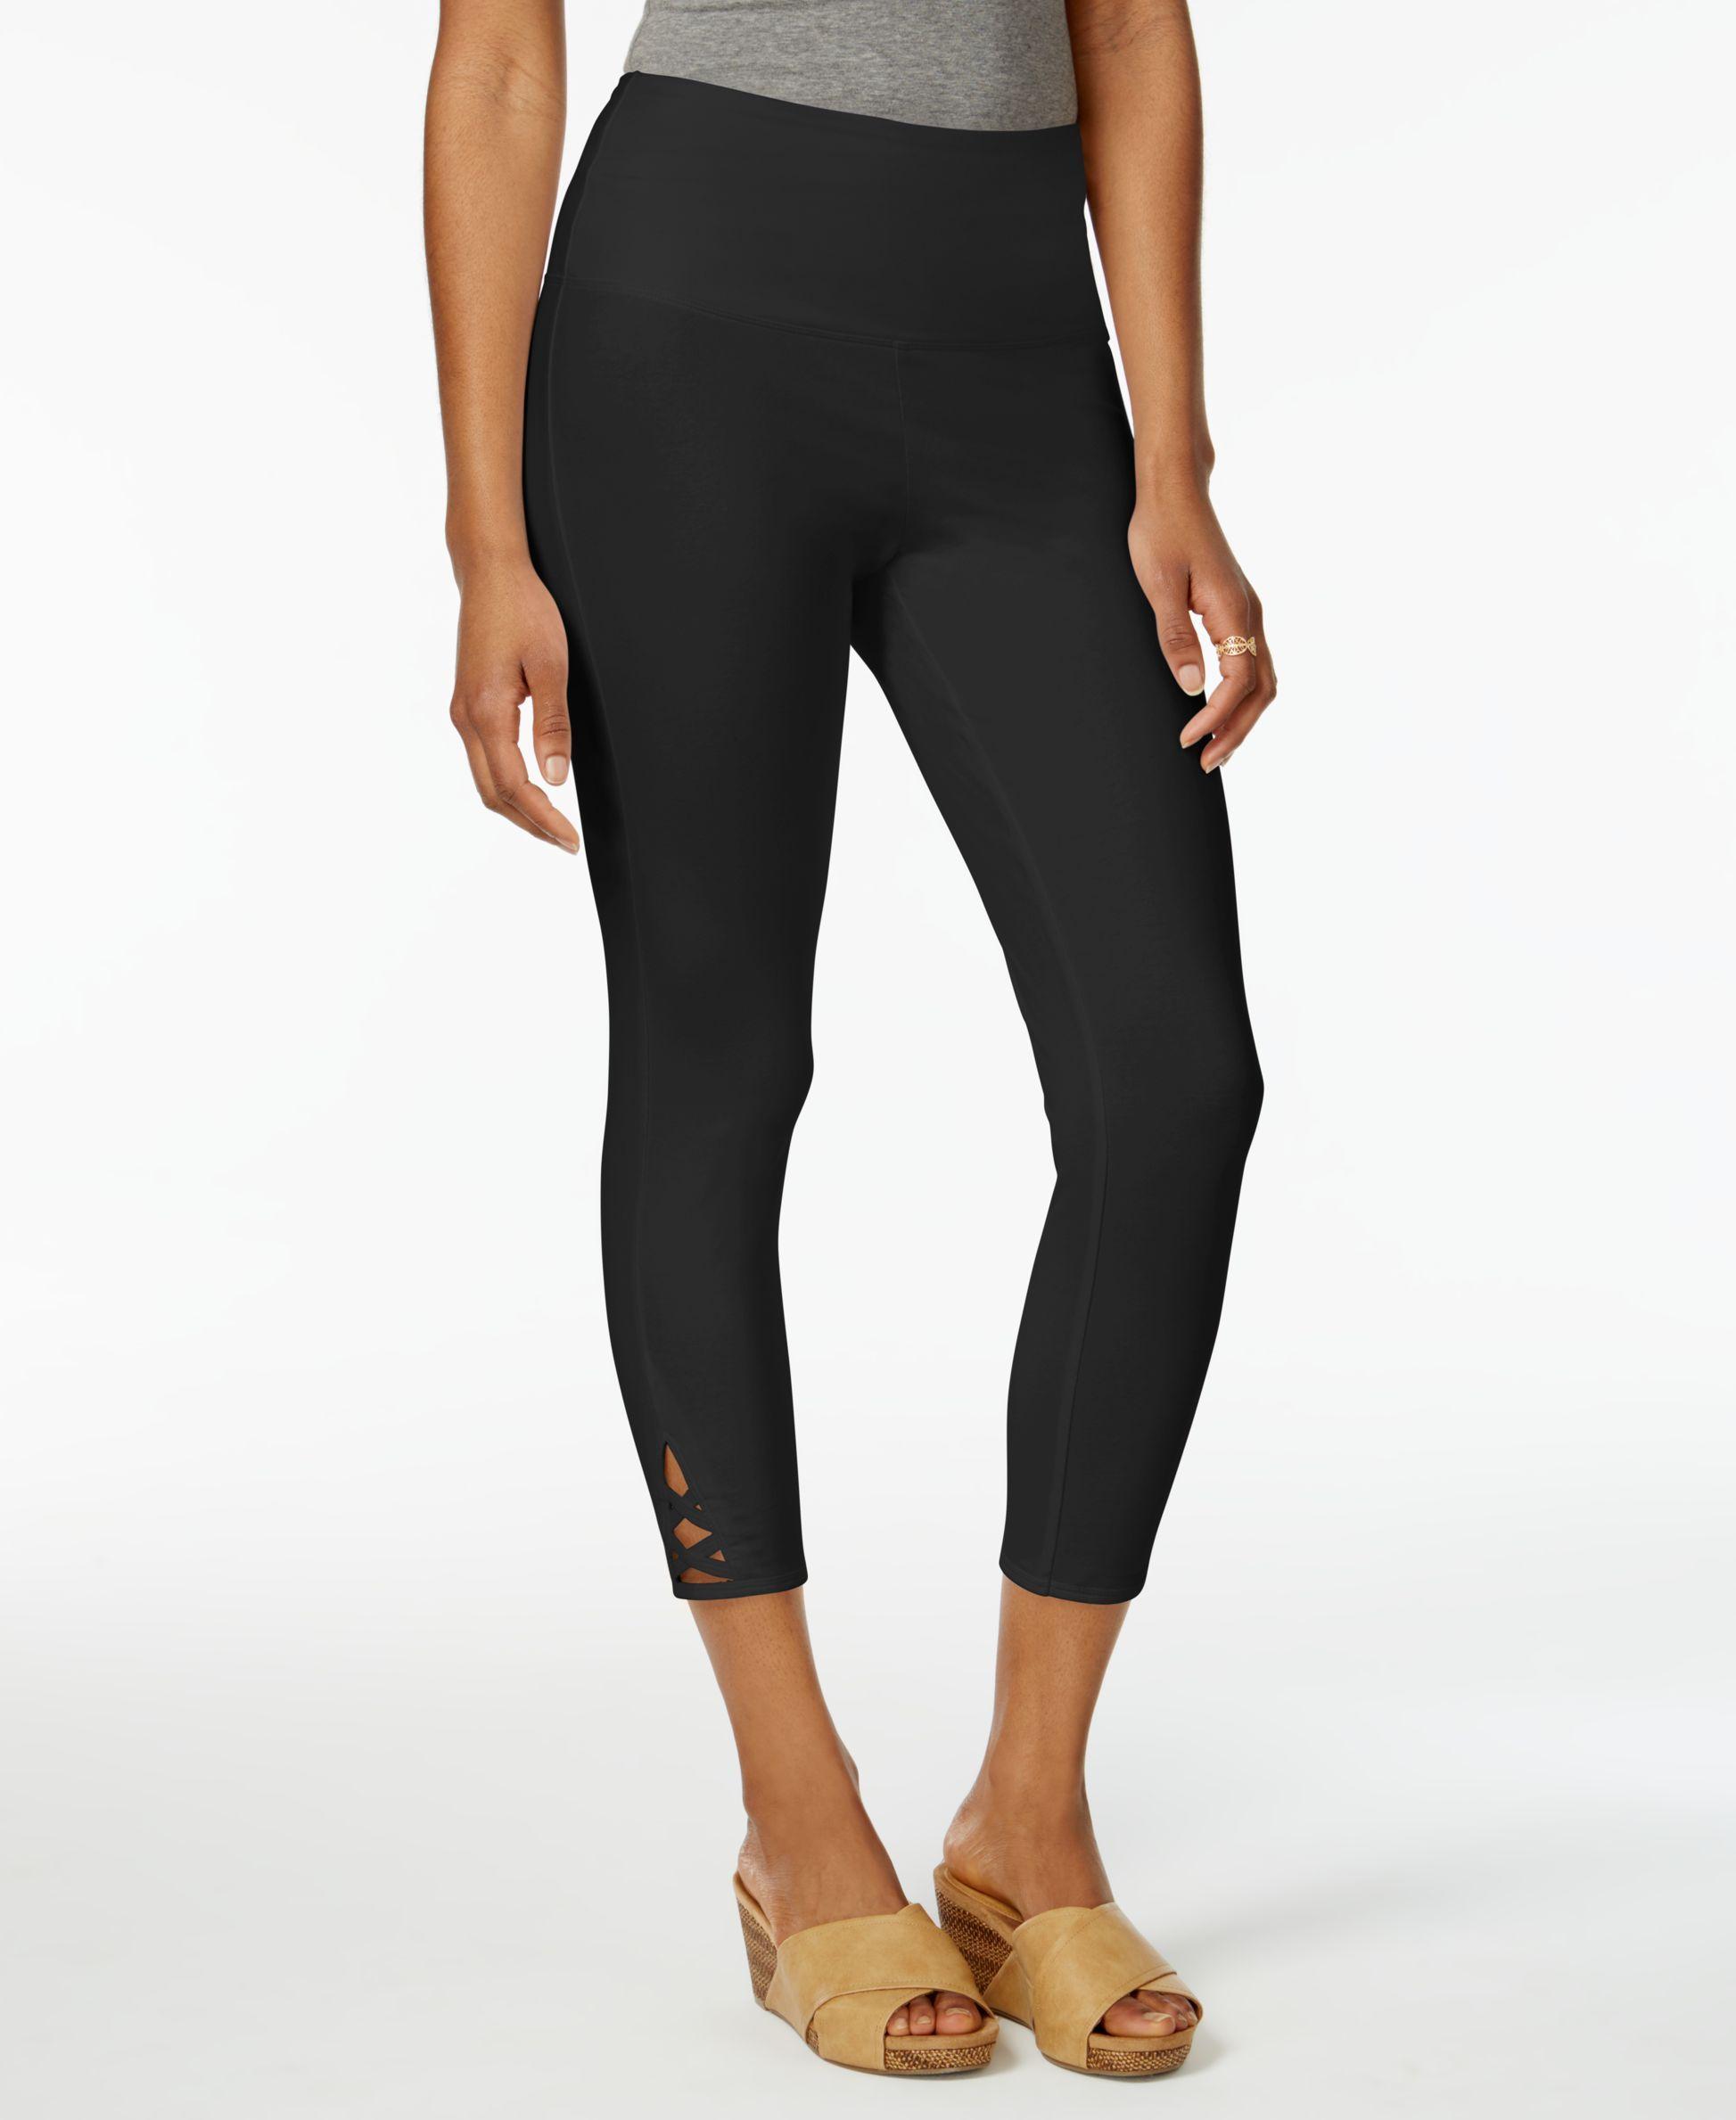 665dac2693 Style & Co Lattice-Hem Tummy Comfort Capri Leggings, Only at Macy's ...